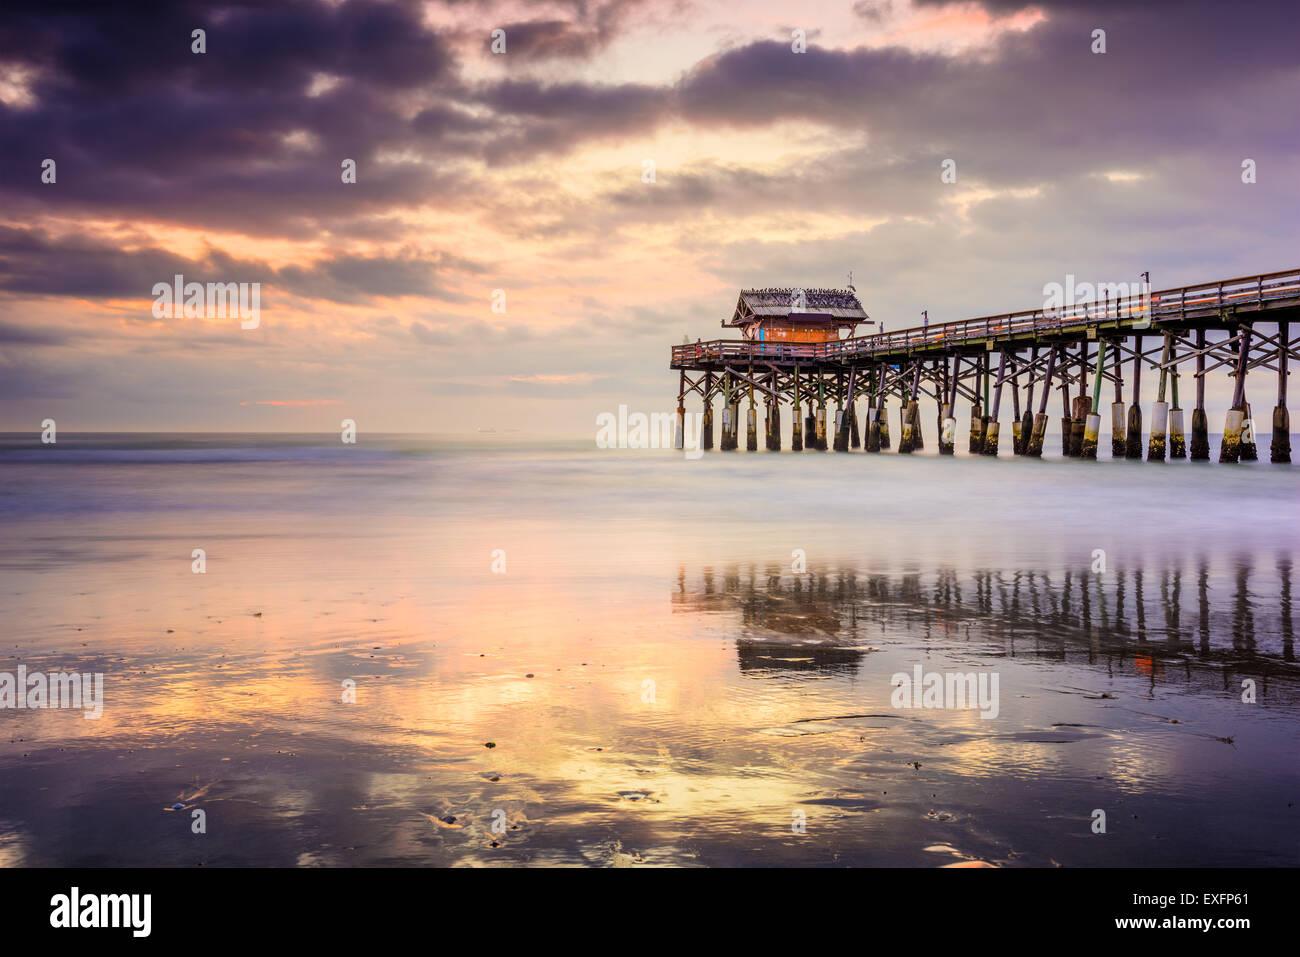 Cocoa Beach, Floride, USA à l'embarcadère. Photo Stock